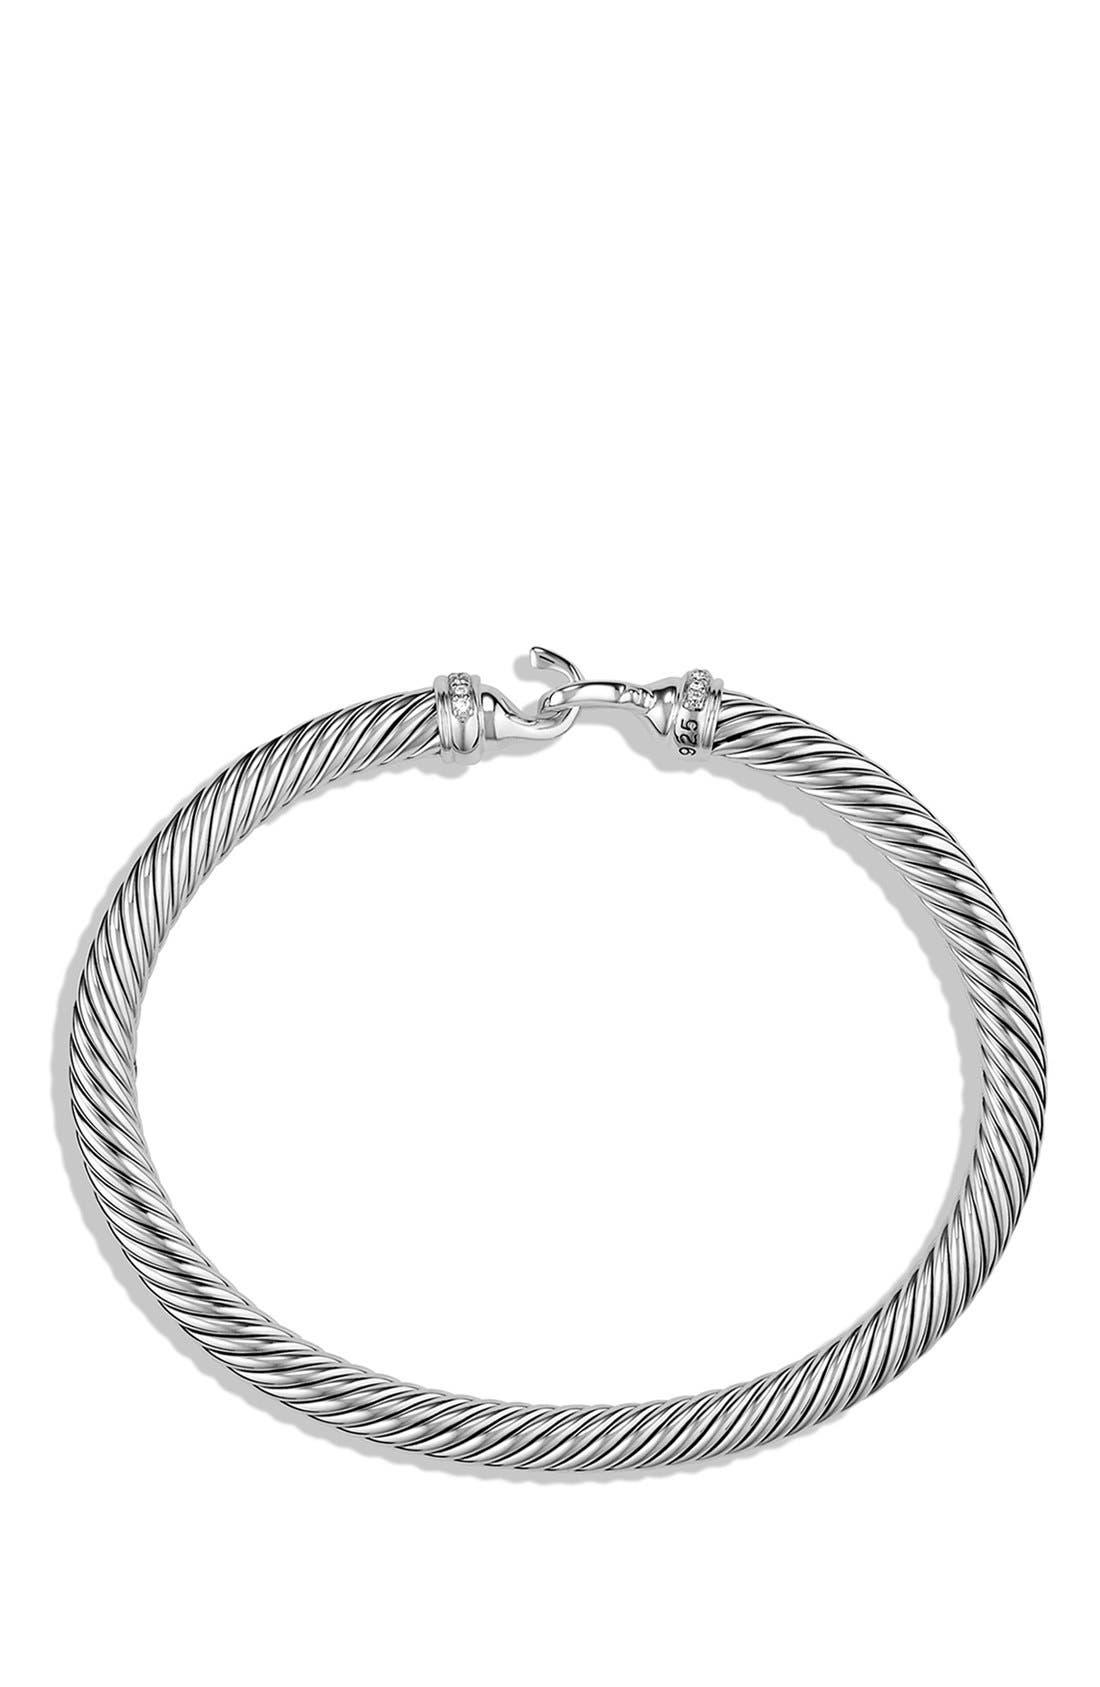 Alternate Image 2  - David Yurman 'Cable Buckle' Bracelet with Diamonds